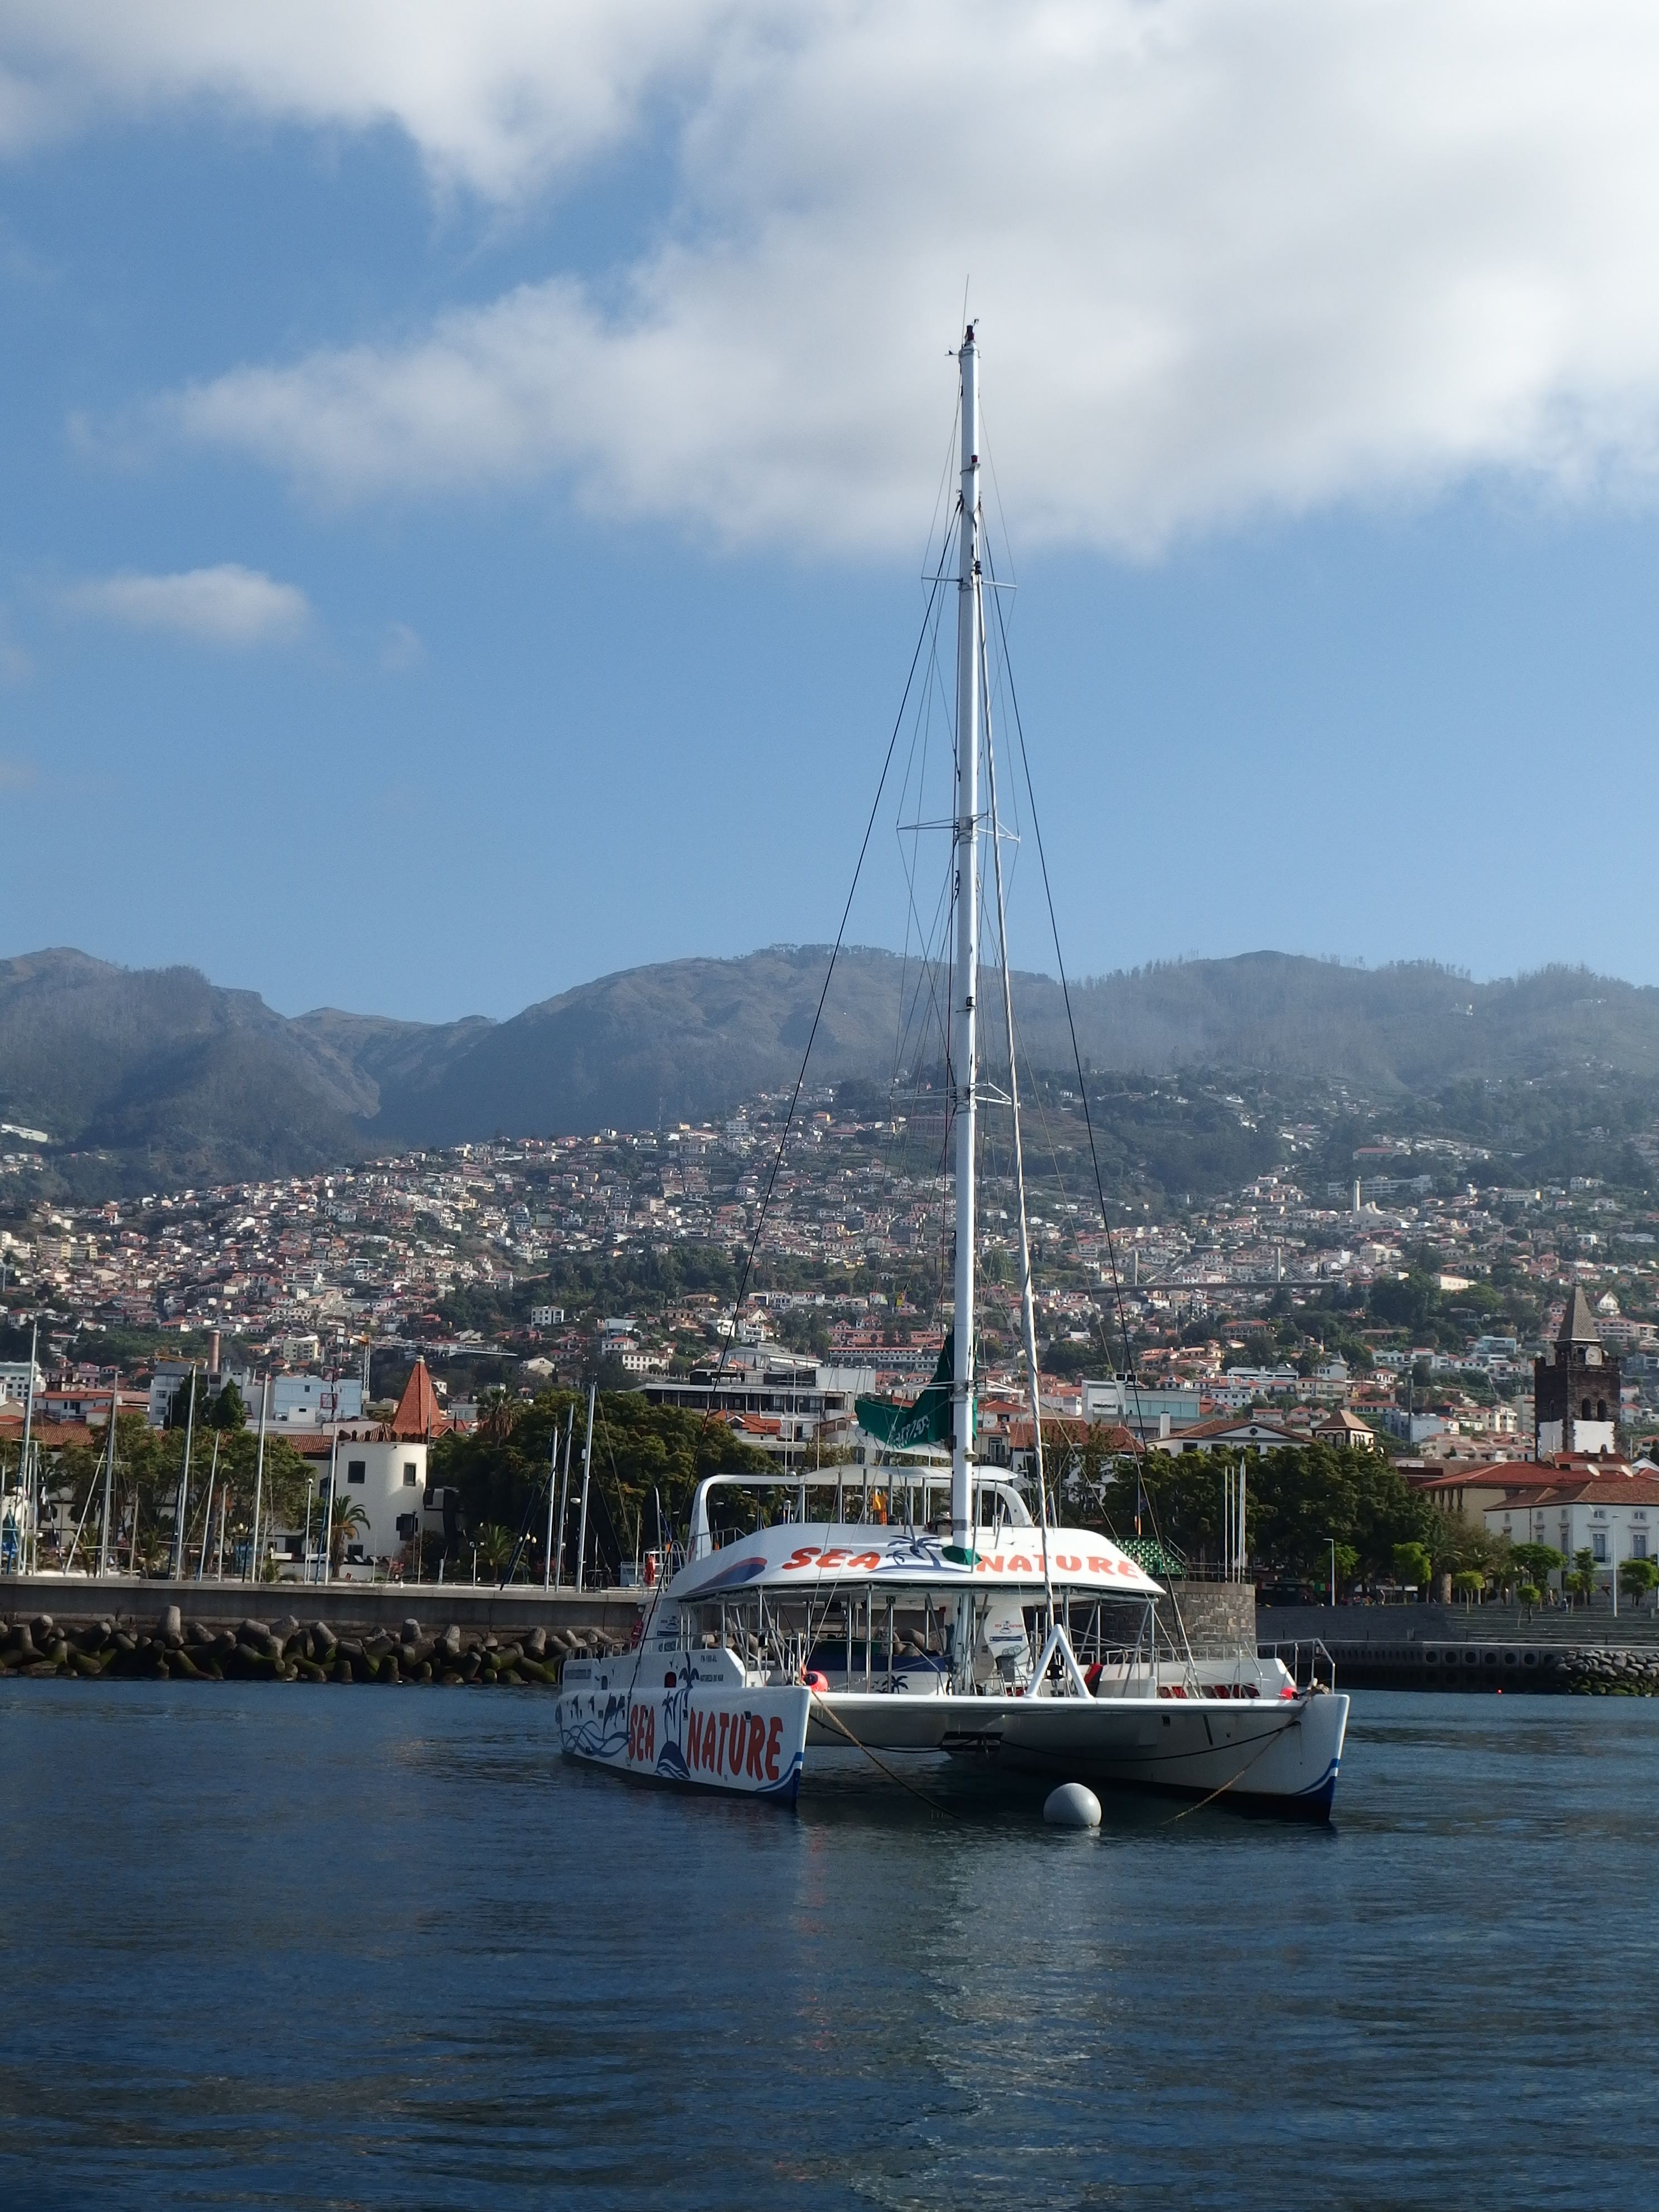 Stampin' Up! Incentive Trip Madeira #2